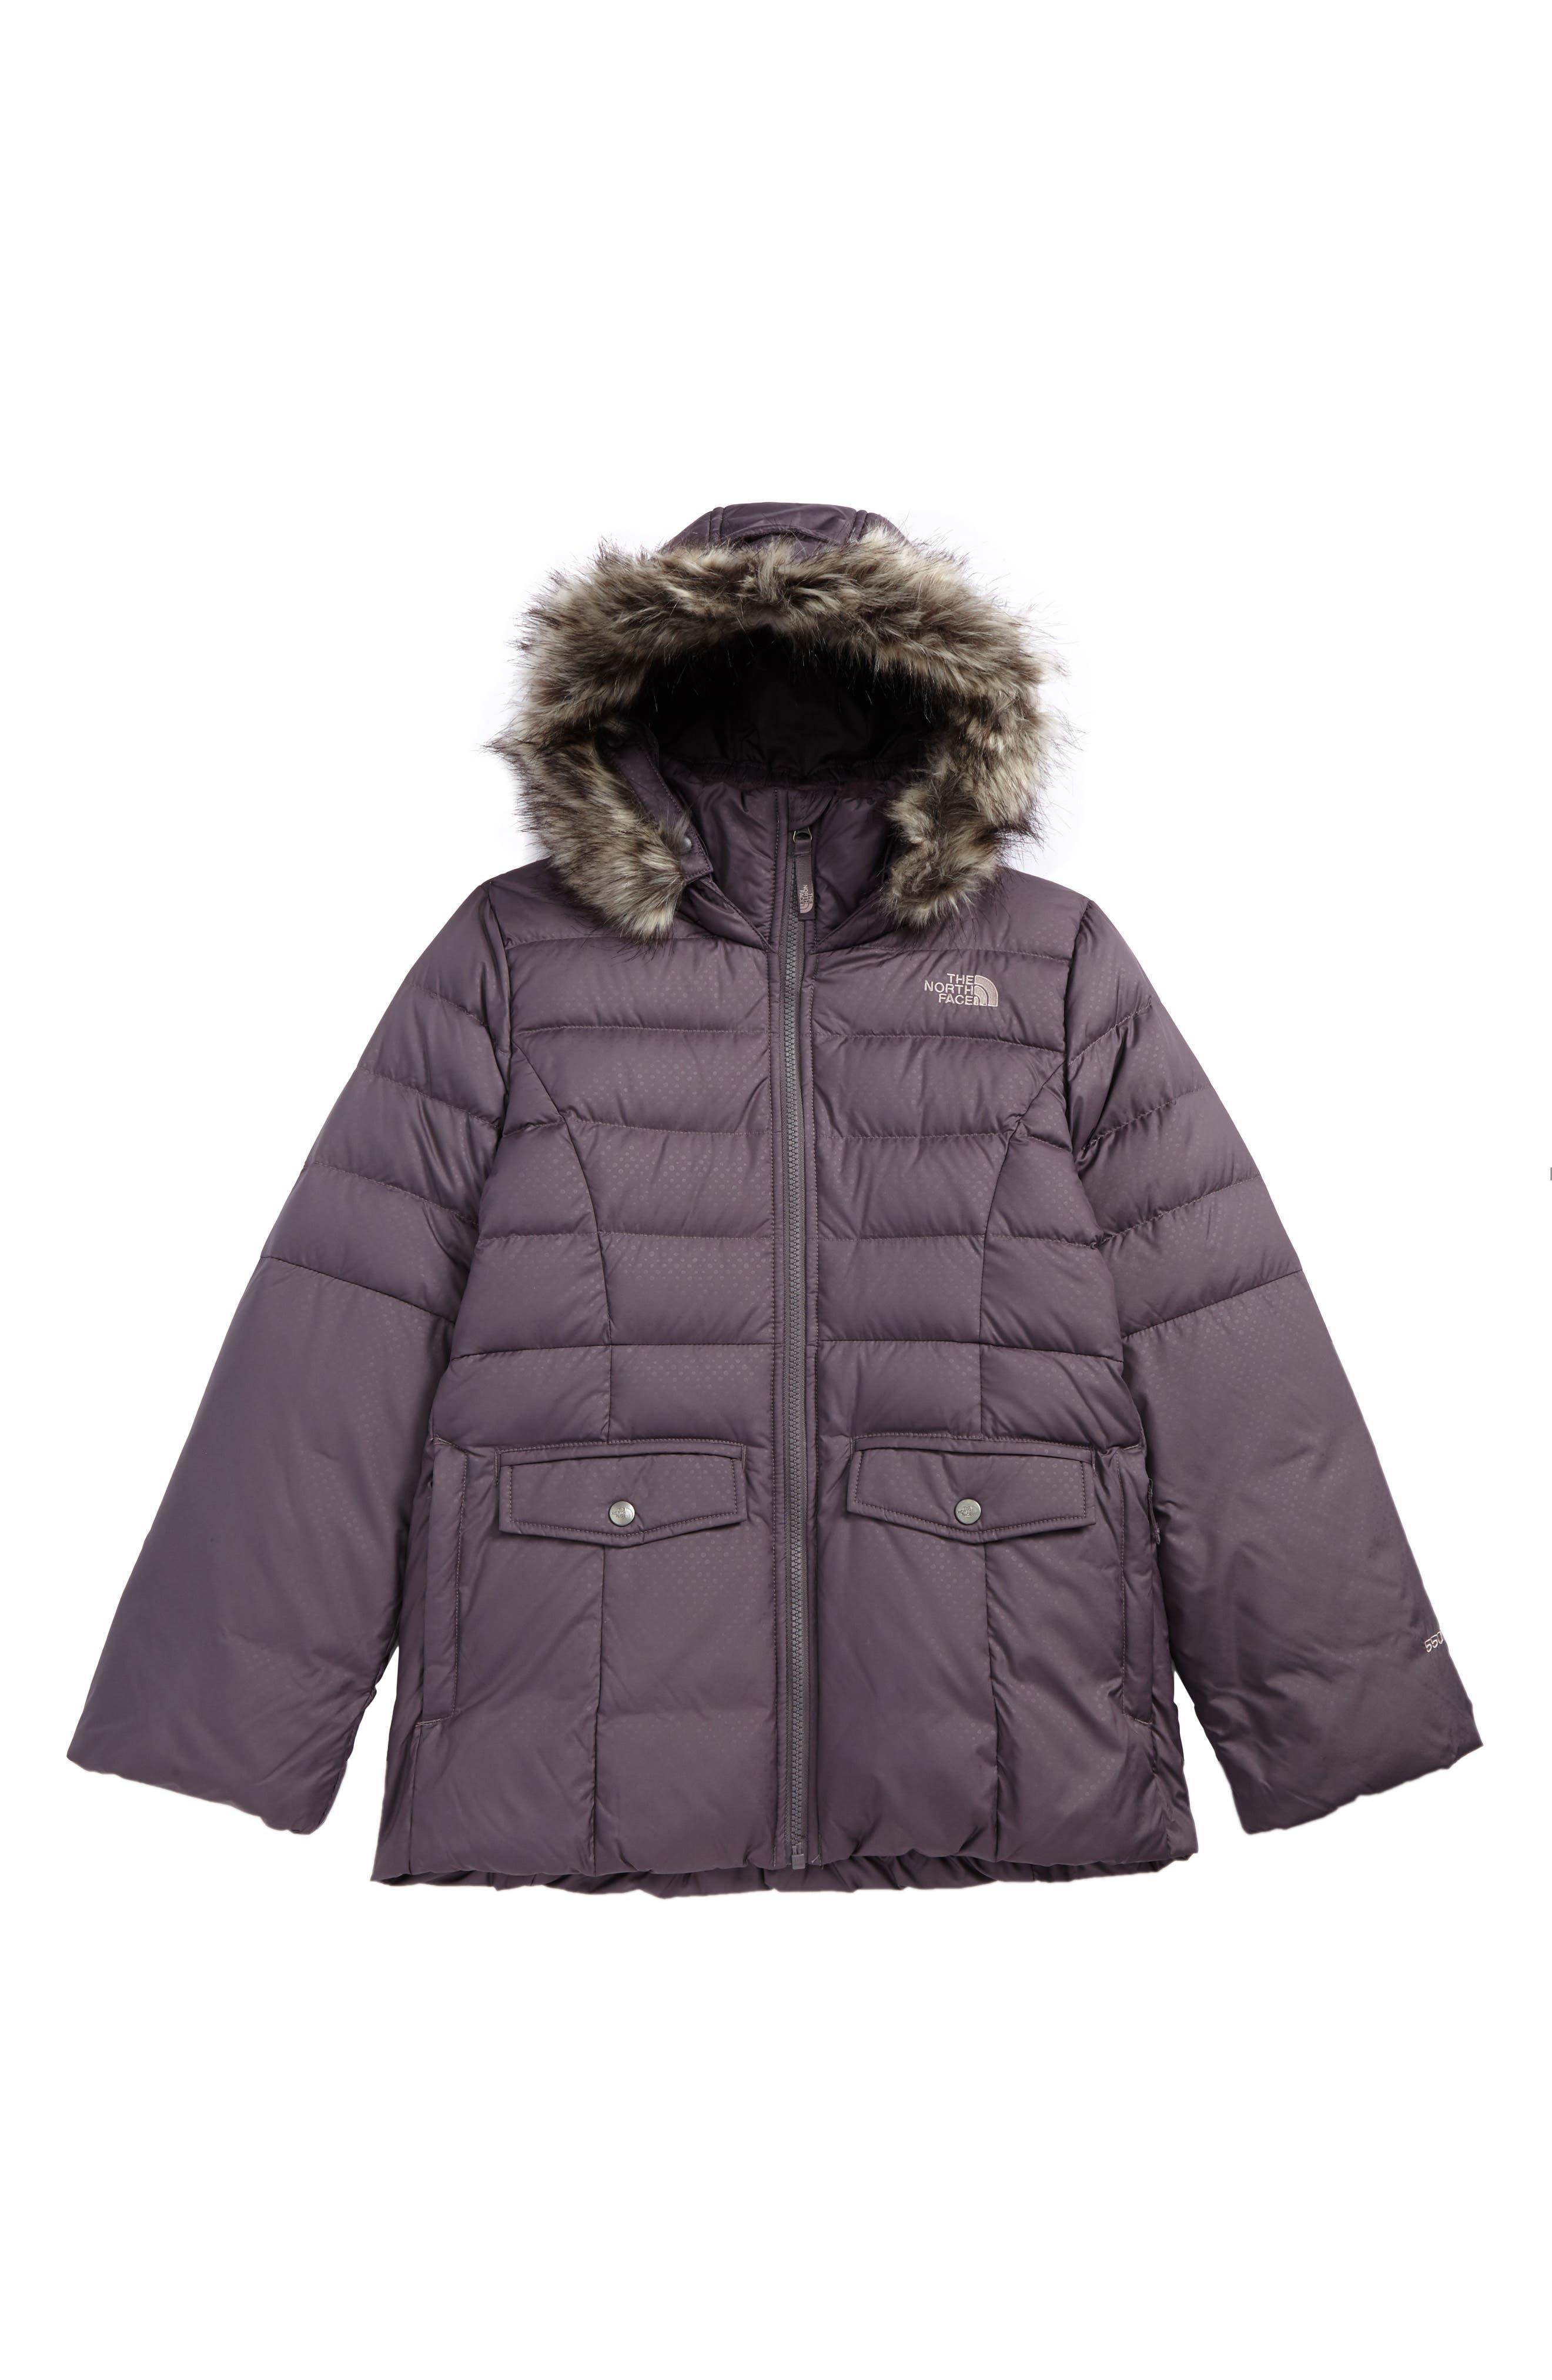 Gotham 2.0 550-Fill Down Jacket,                         Main,                         color, Rabbit Grey